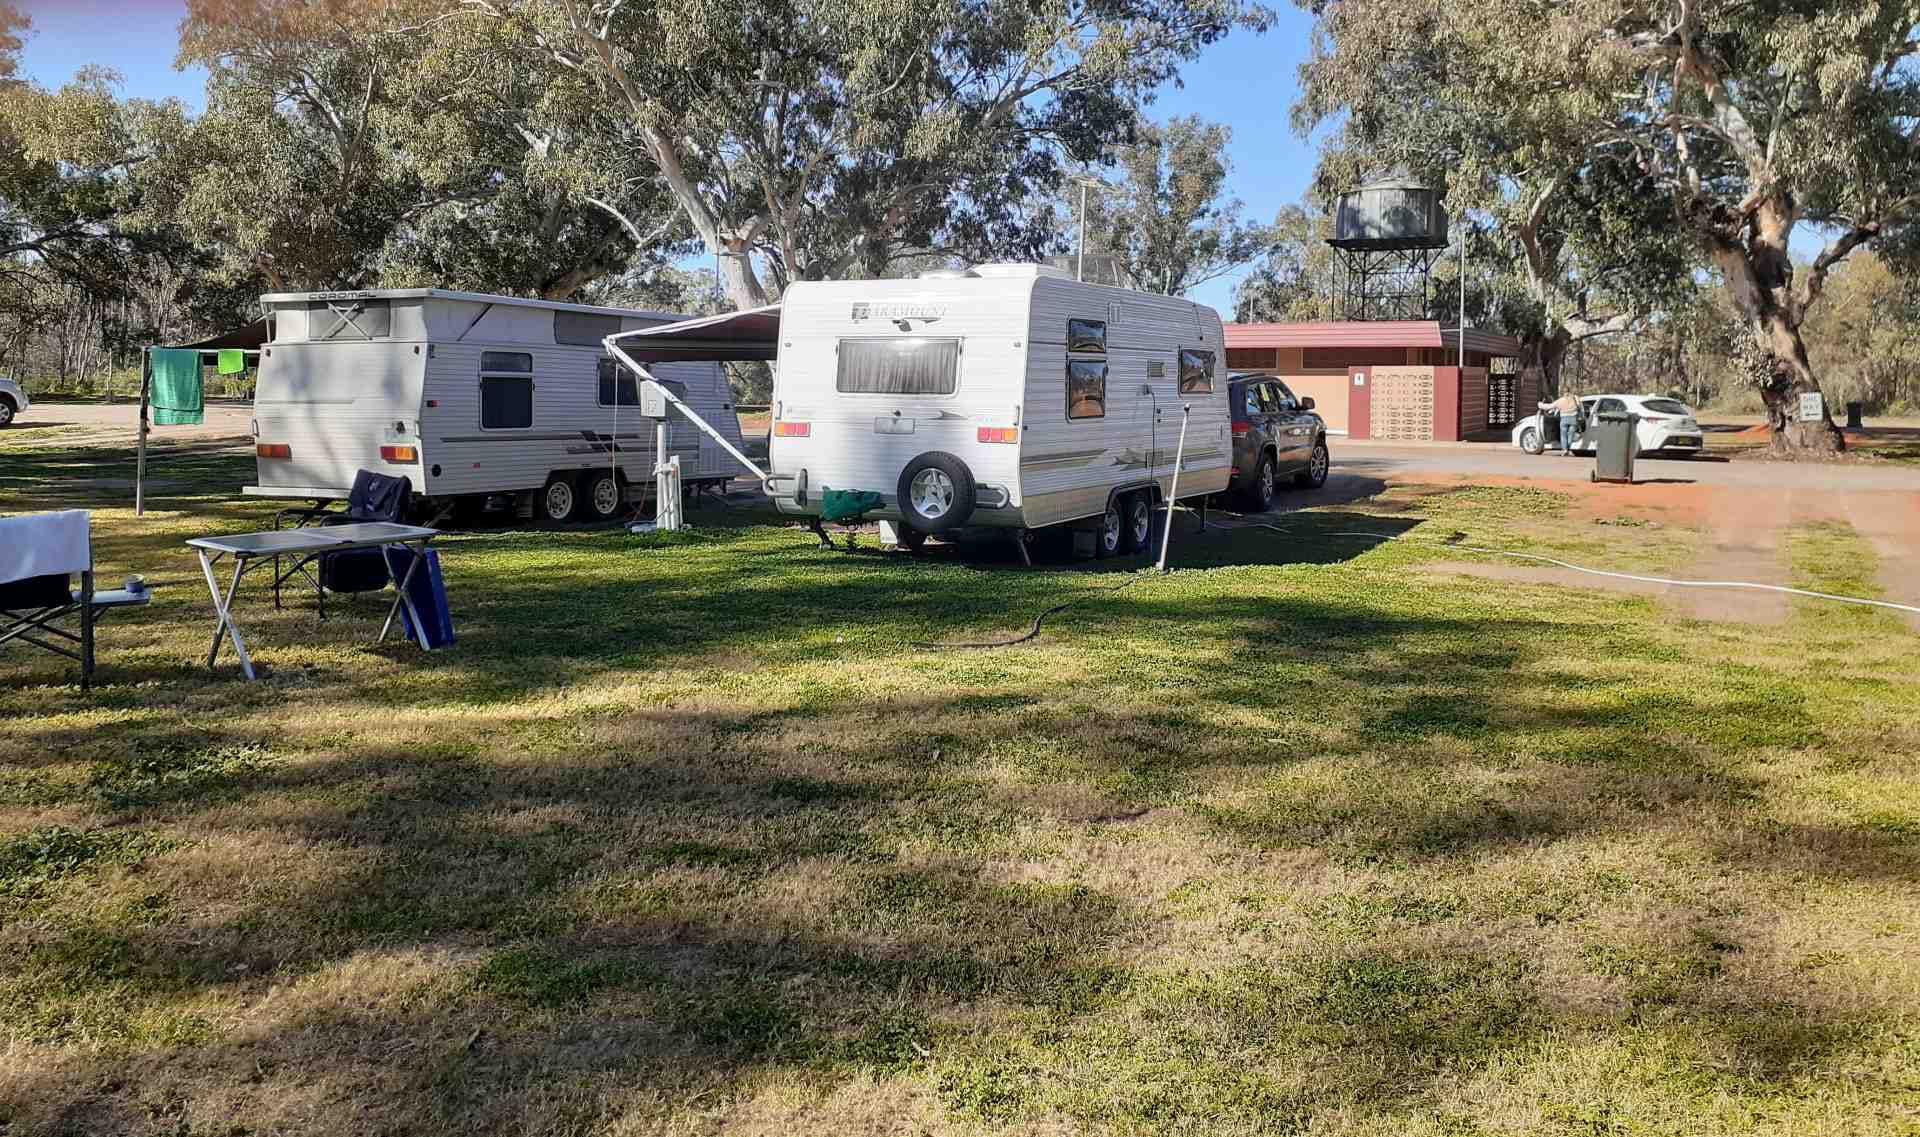 Victory Park Caravan Park Wilcannia NSW - image Trevor Ball